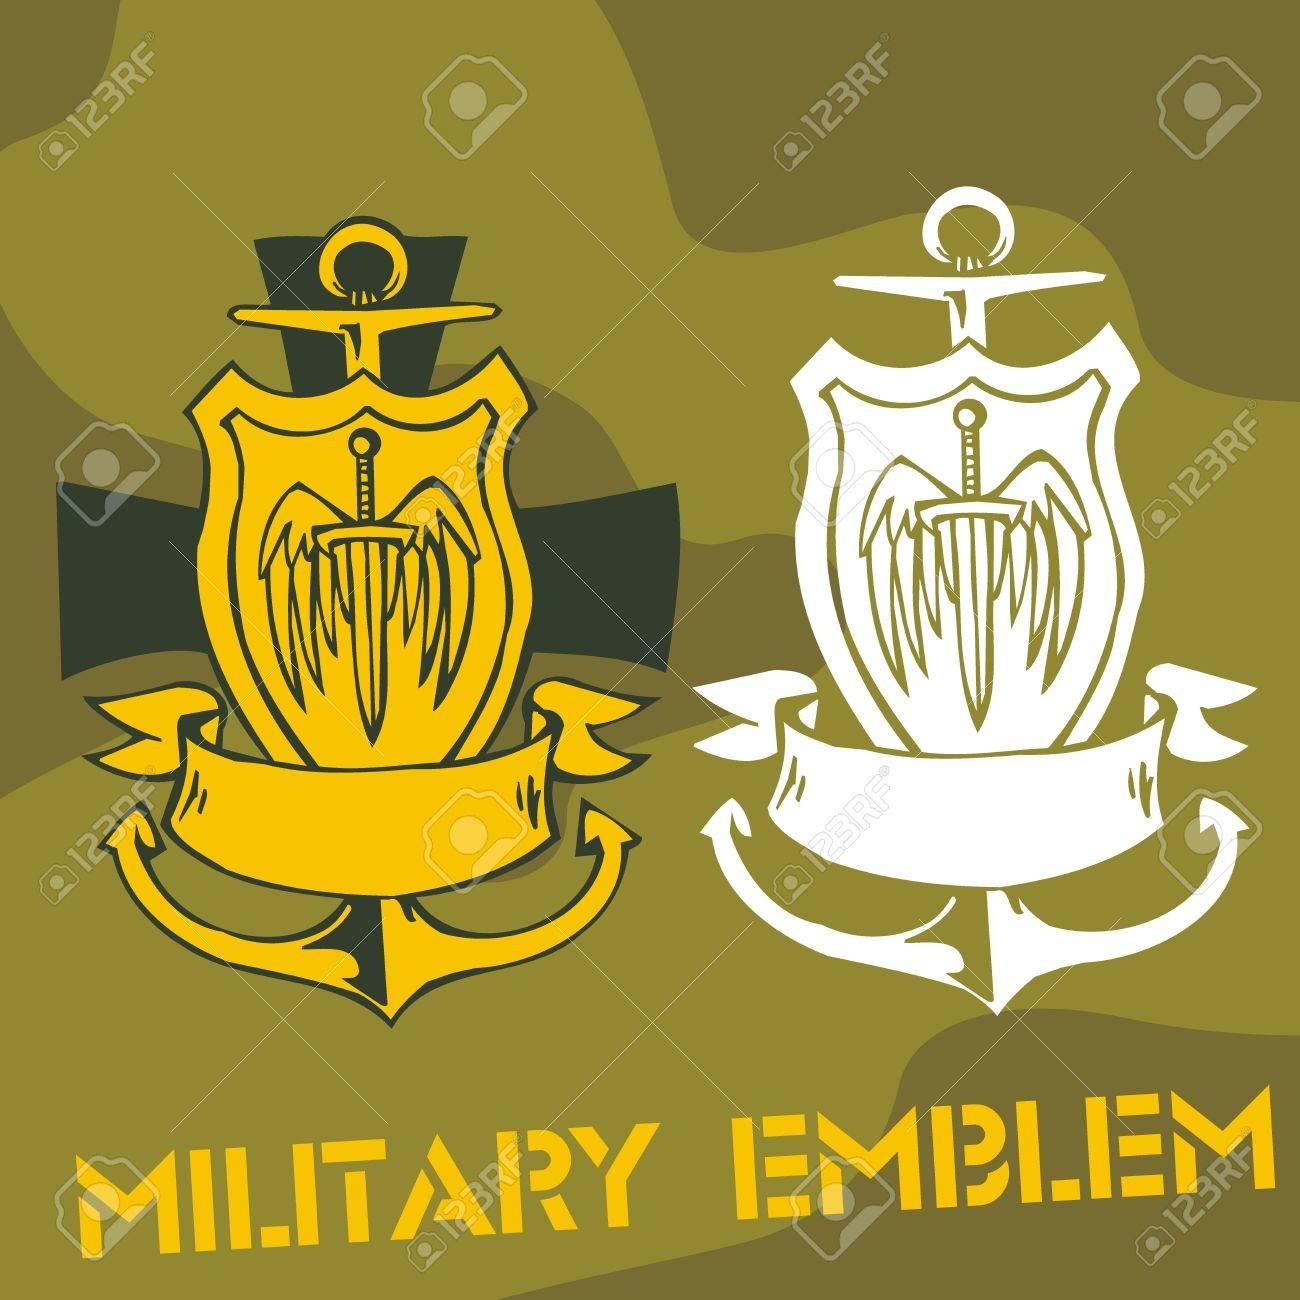 Military Emblem Stock Vector - 16719372